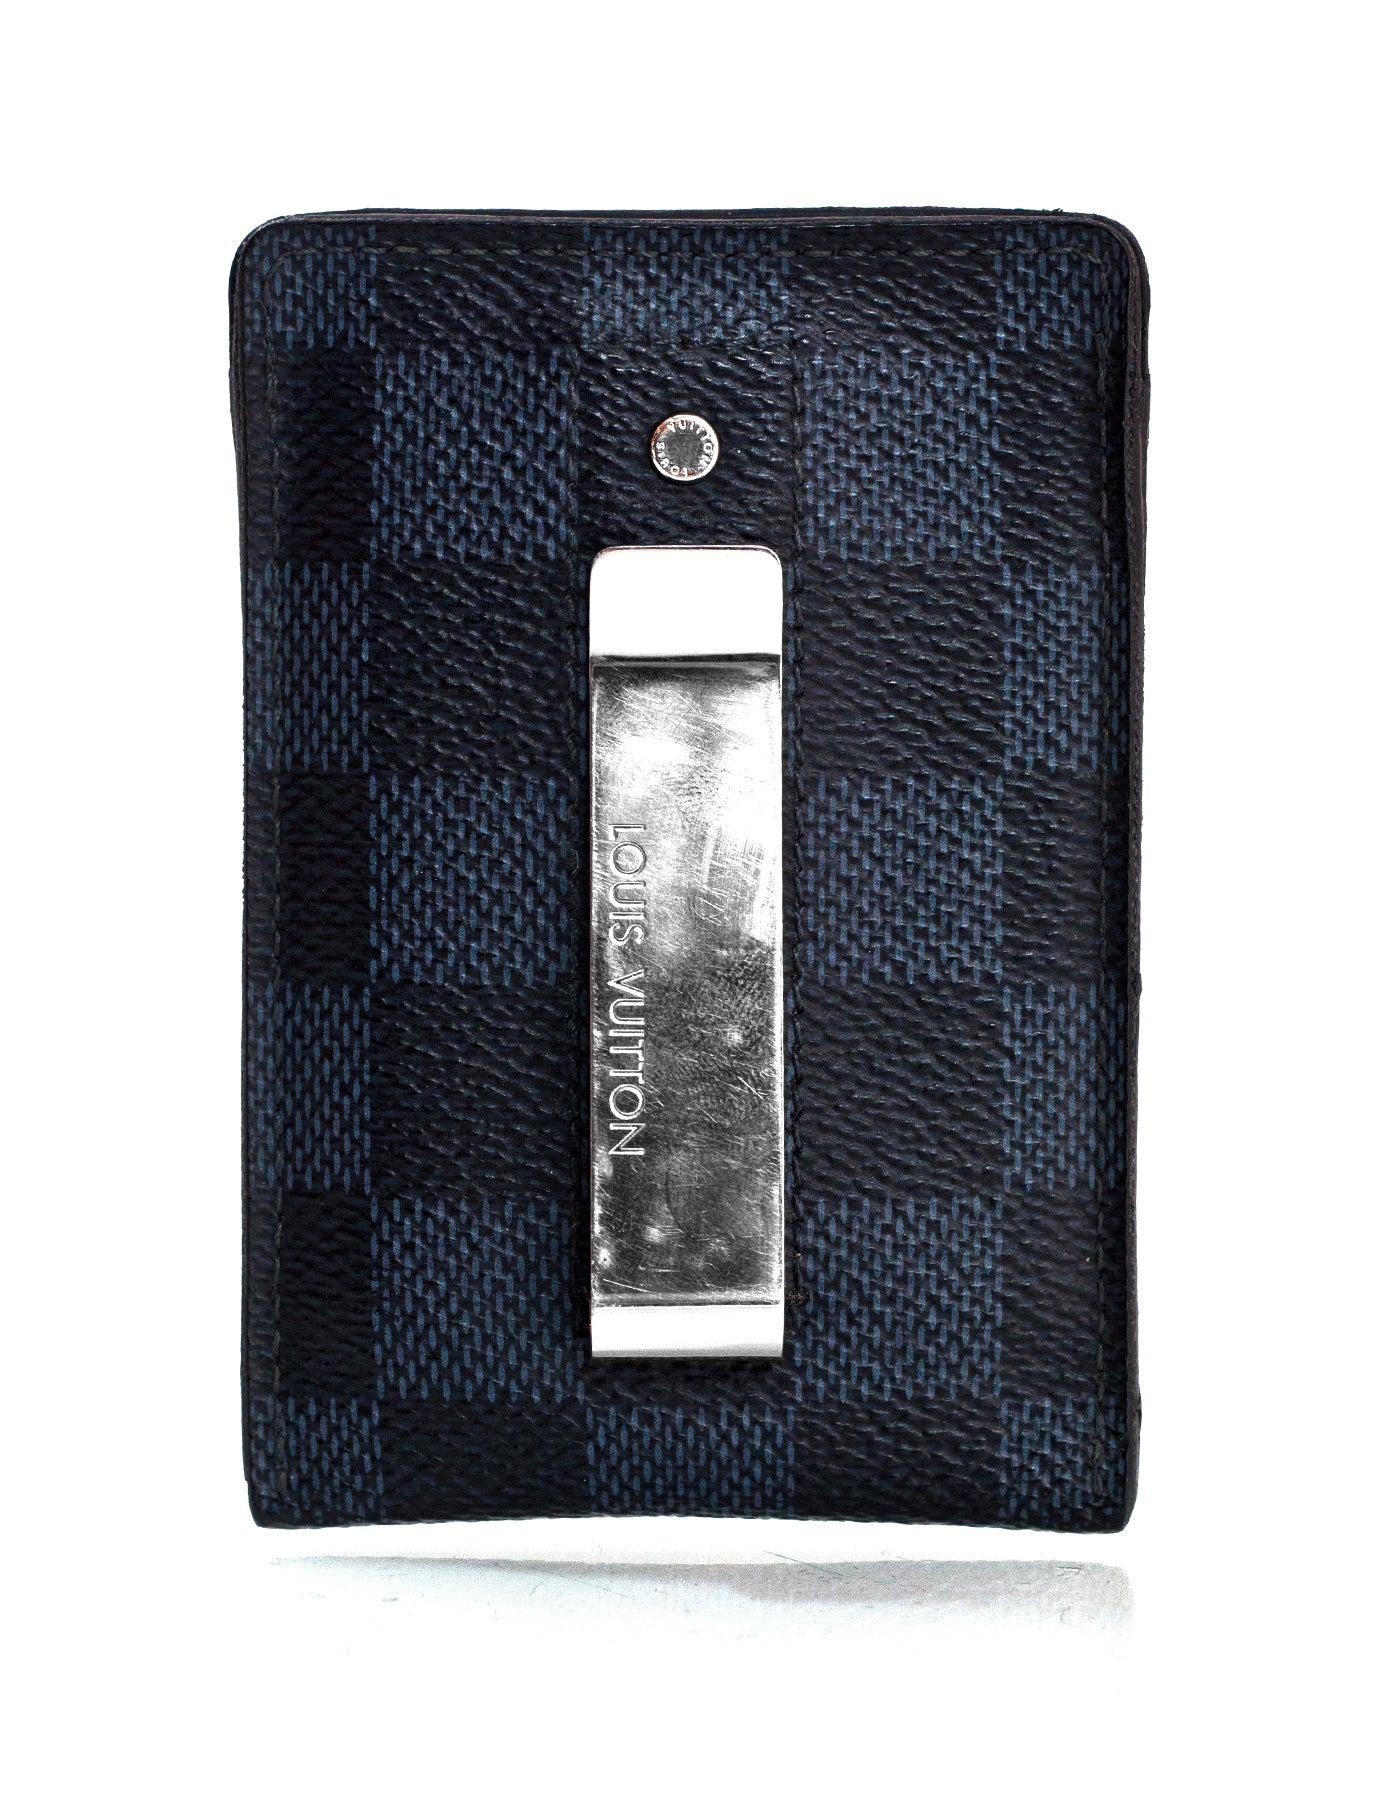 285f8e560129 Louis Vuitton Men s Damier Cobalt Card Holder Money Clip SHW For Sale at  1stdibs